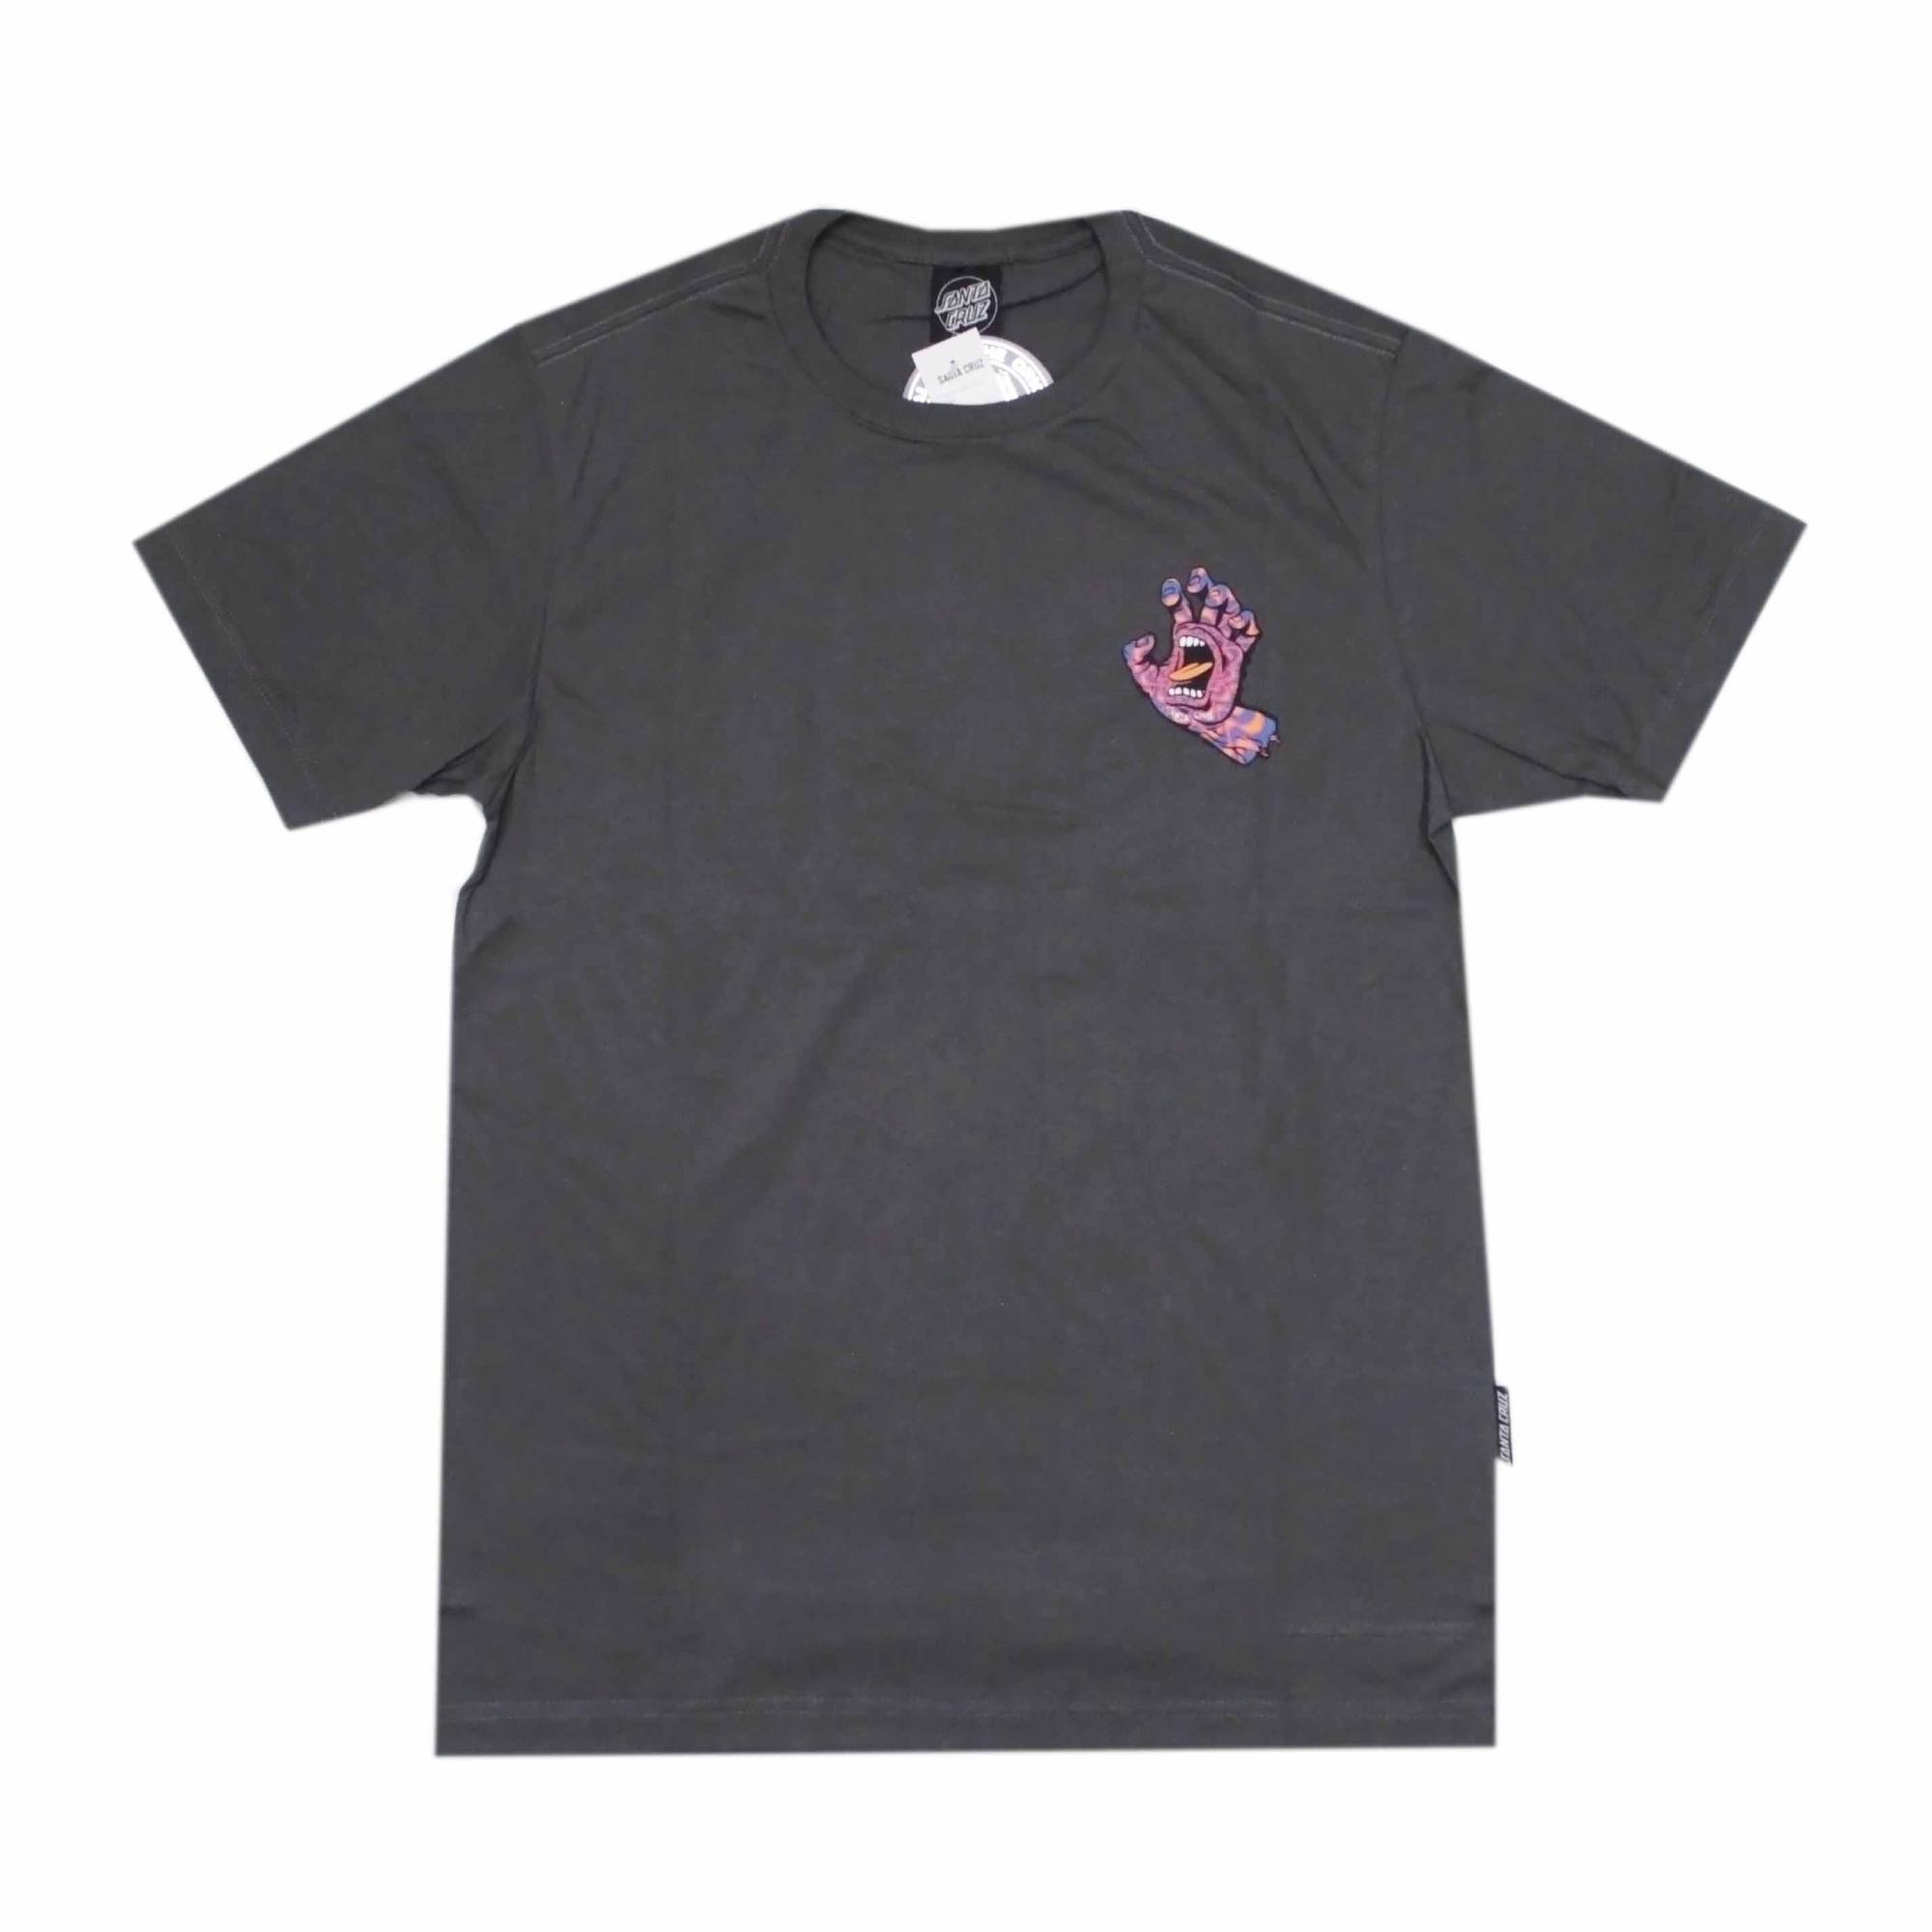 Camiseta Santa Cruz Kaleido Hand - Cinza Chumbo